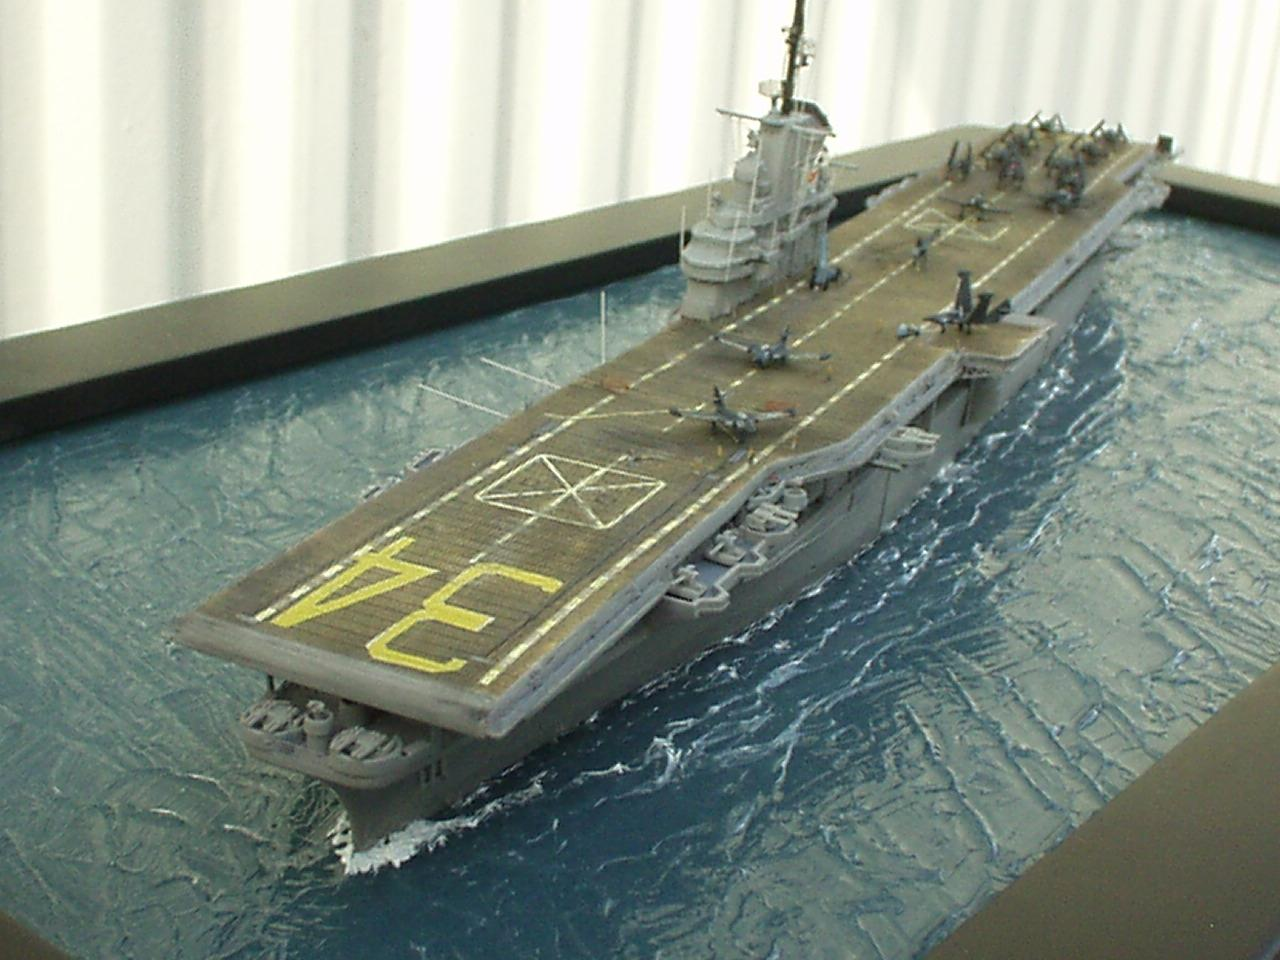 ... carriers Woo Hoo! - Plastic model kits - NRG's Model Ship World